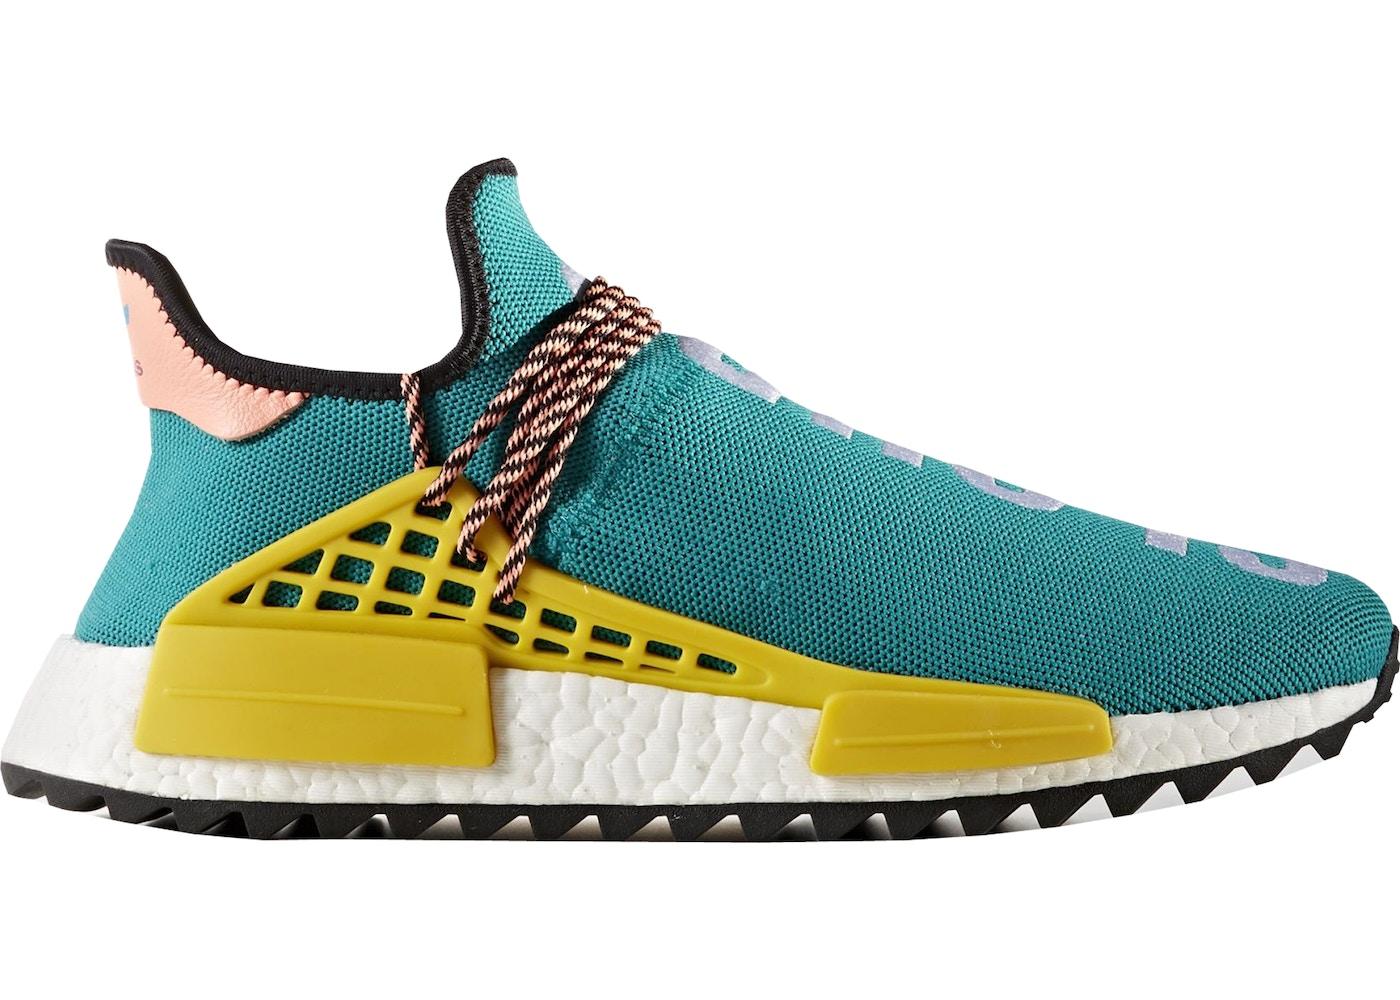 adidas new human race